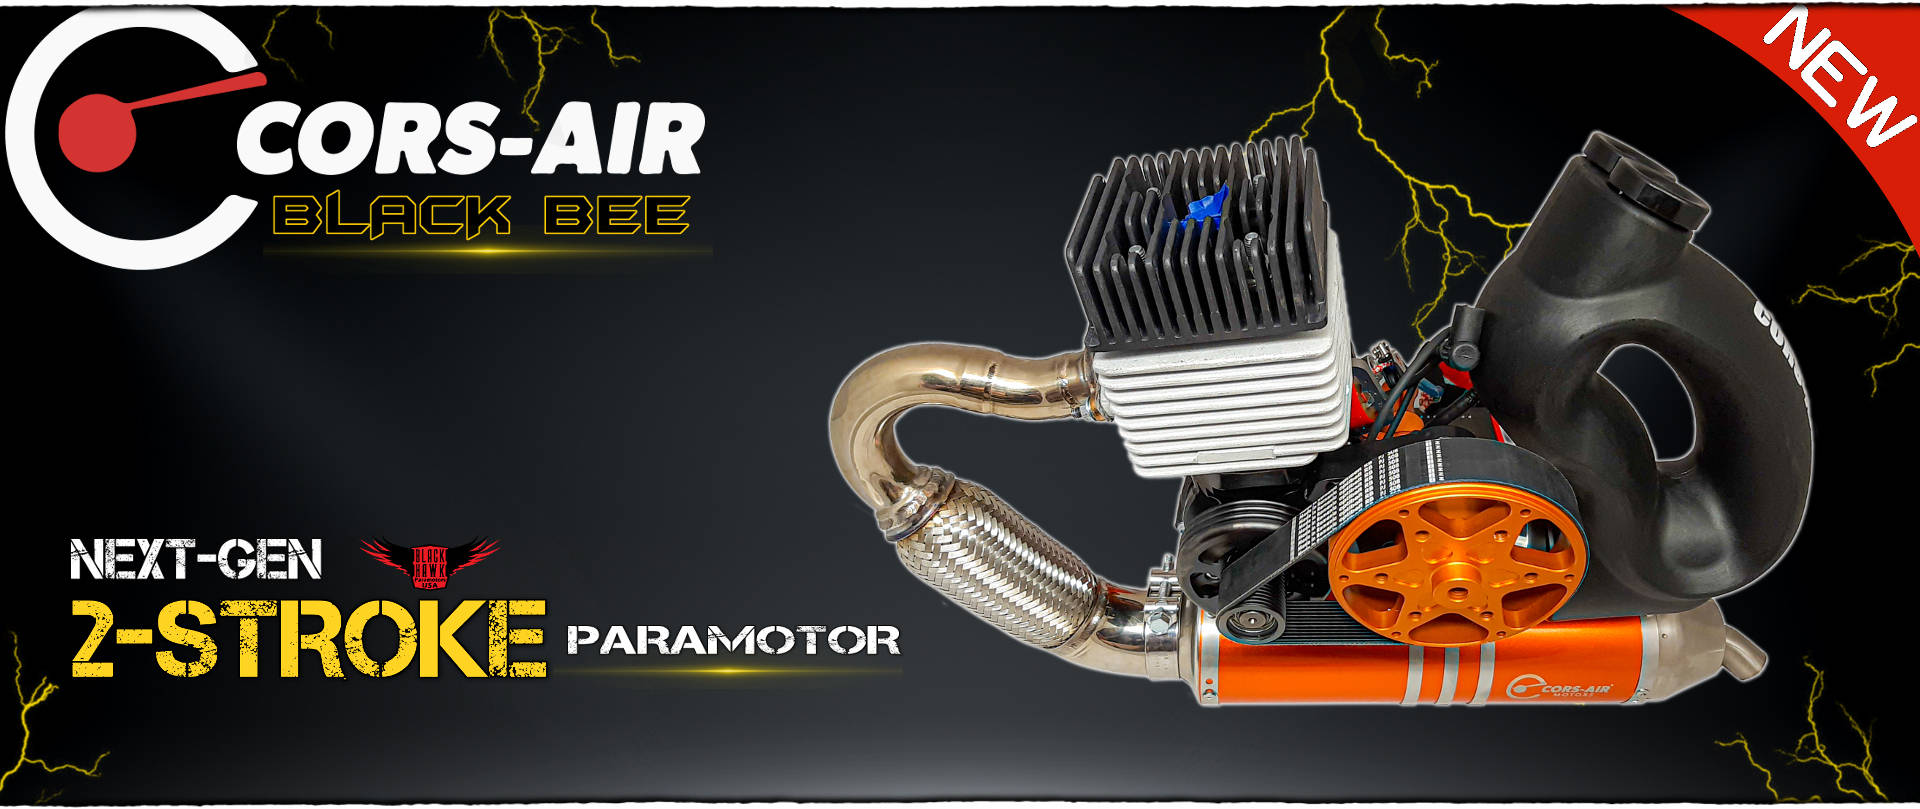 Cors Air Black Bee Paramotor - Available From BlackHawk USA